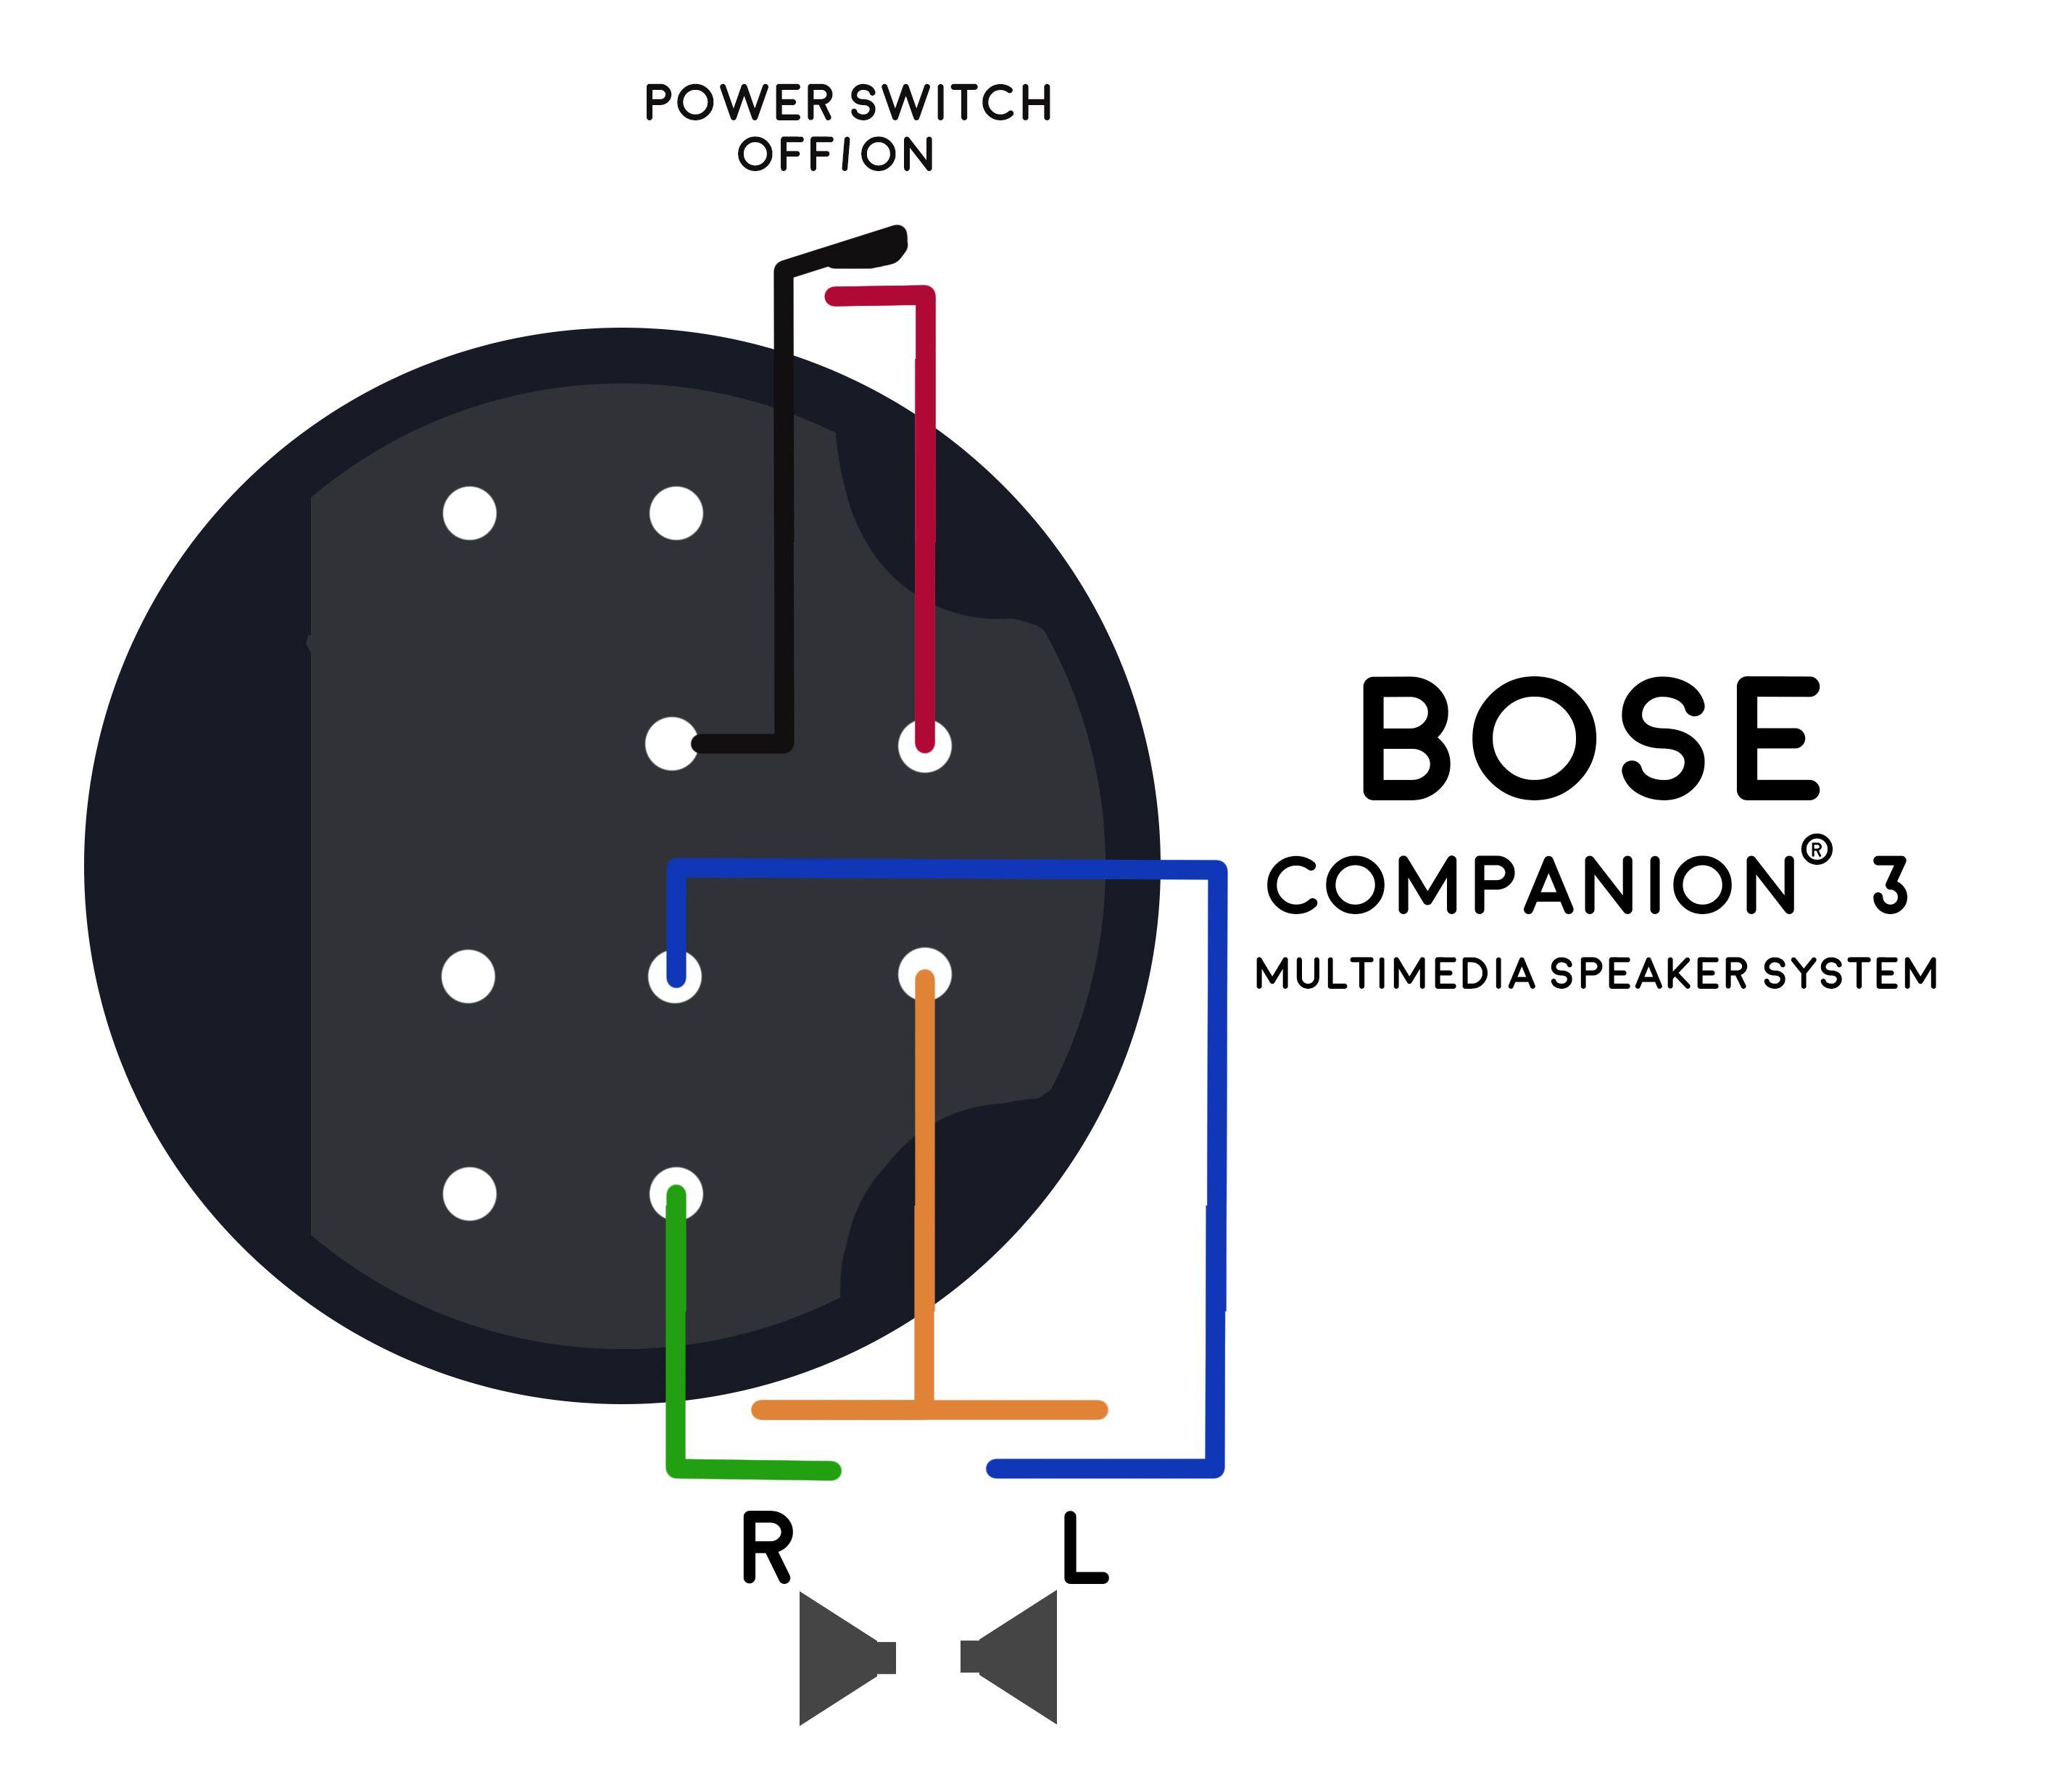 Control Pod Bose Companion 3 Diagrama Para Hacer Funcionar Directo Planos Bose Proyectos